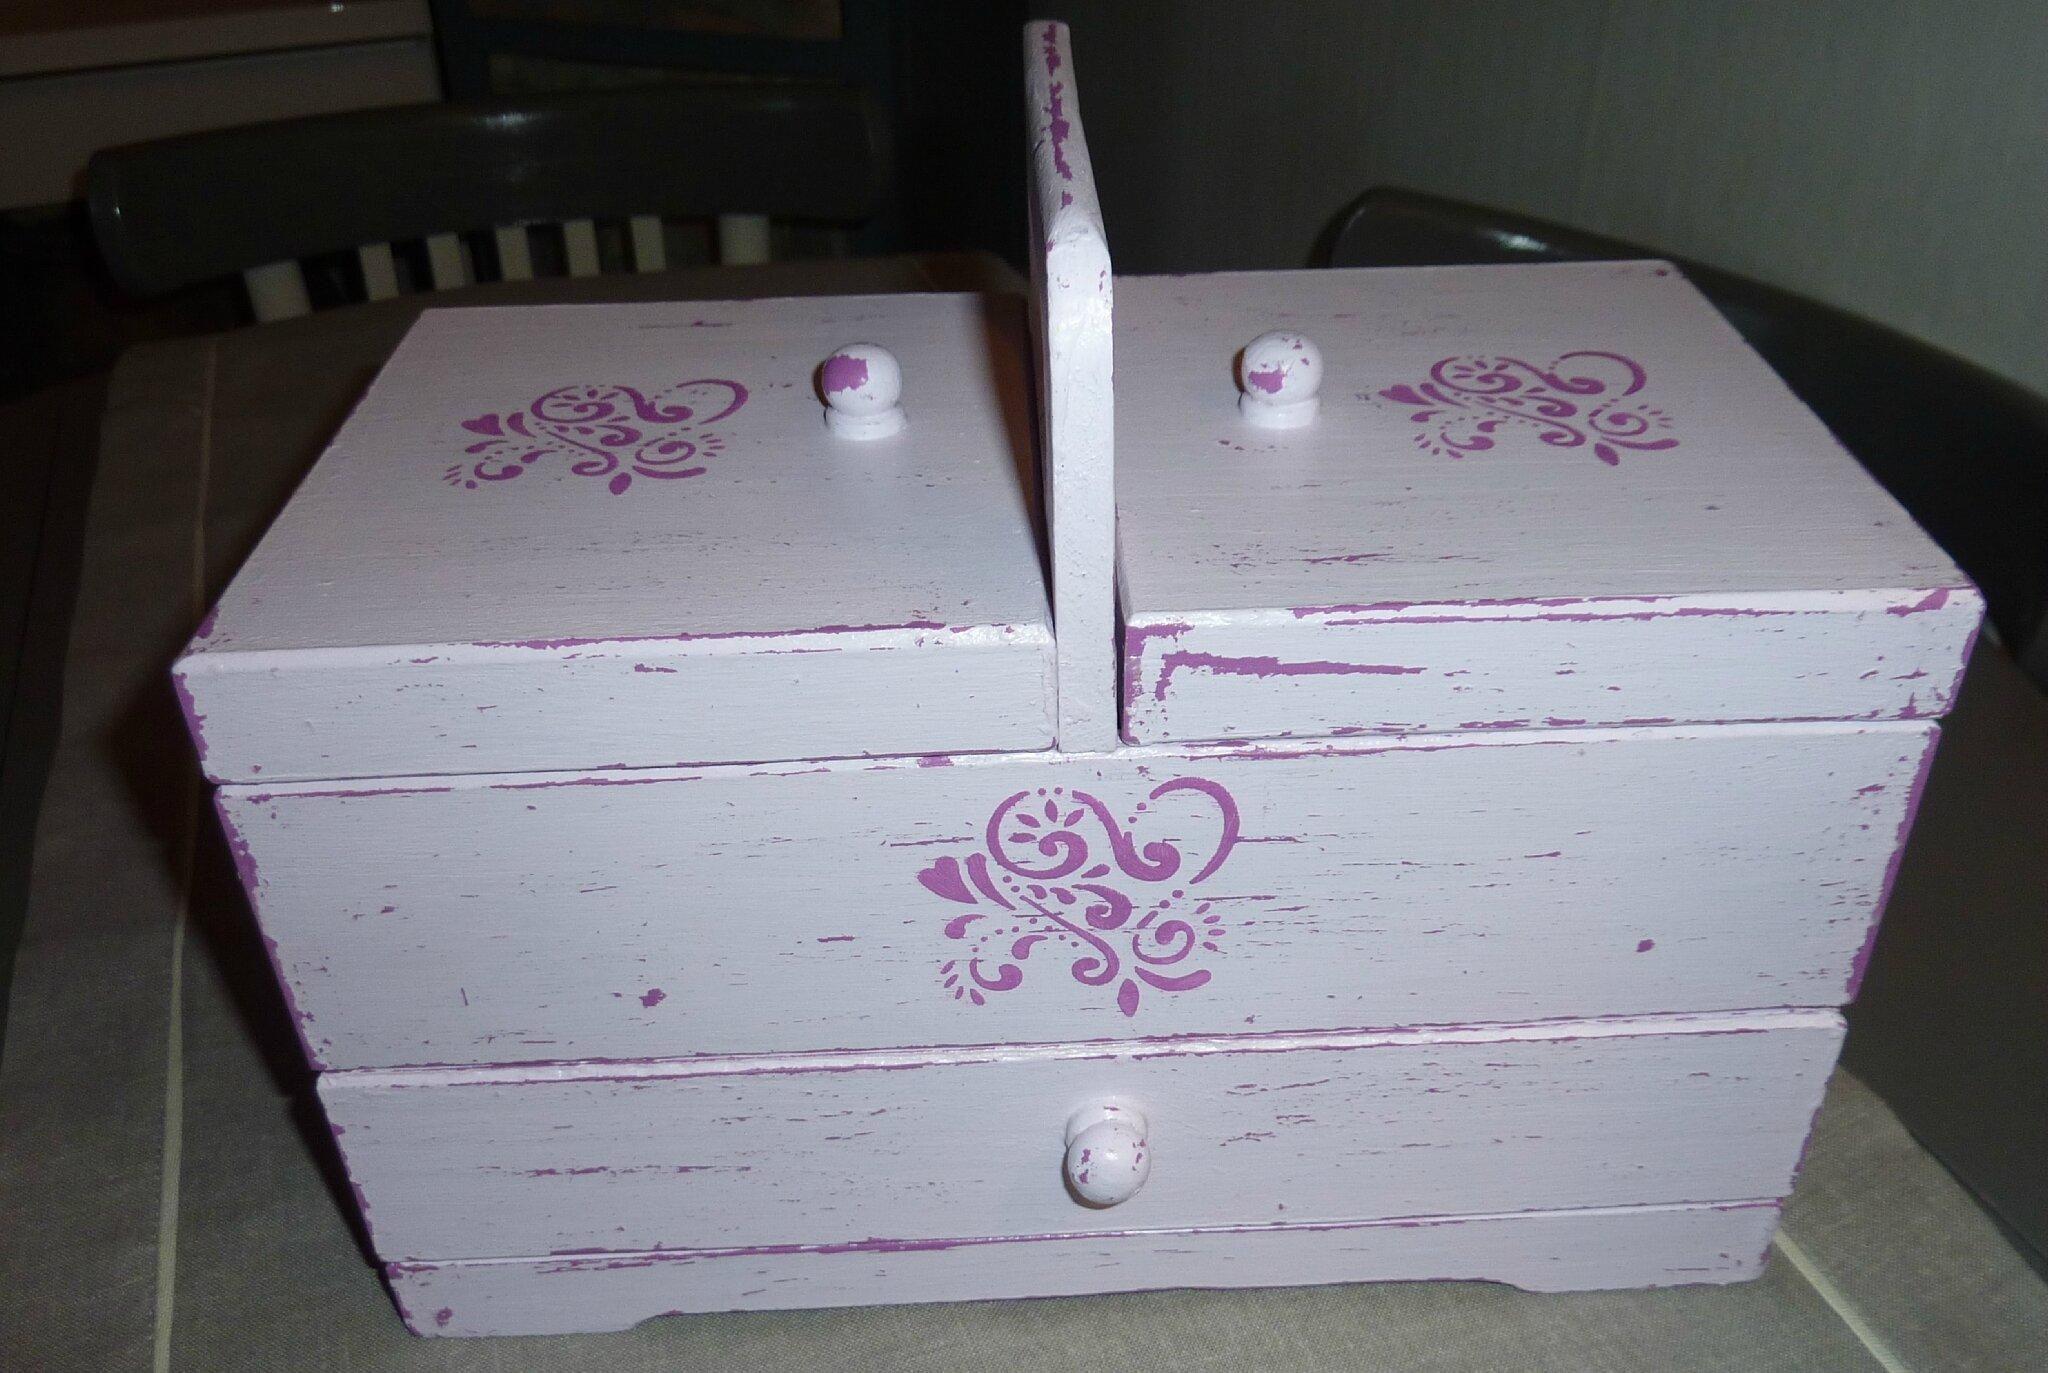 Boite couture vintage effet shabby rose vies de greniers for La boite a couture 03500